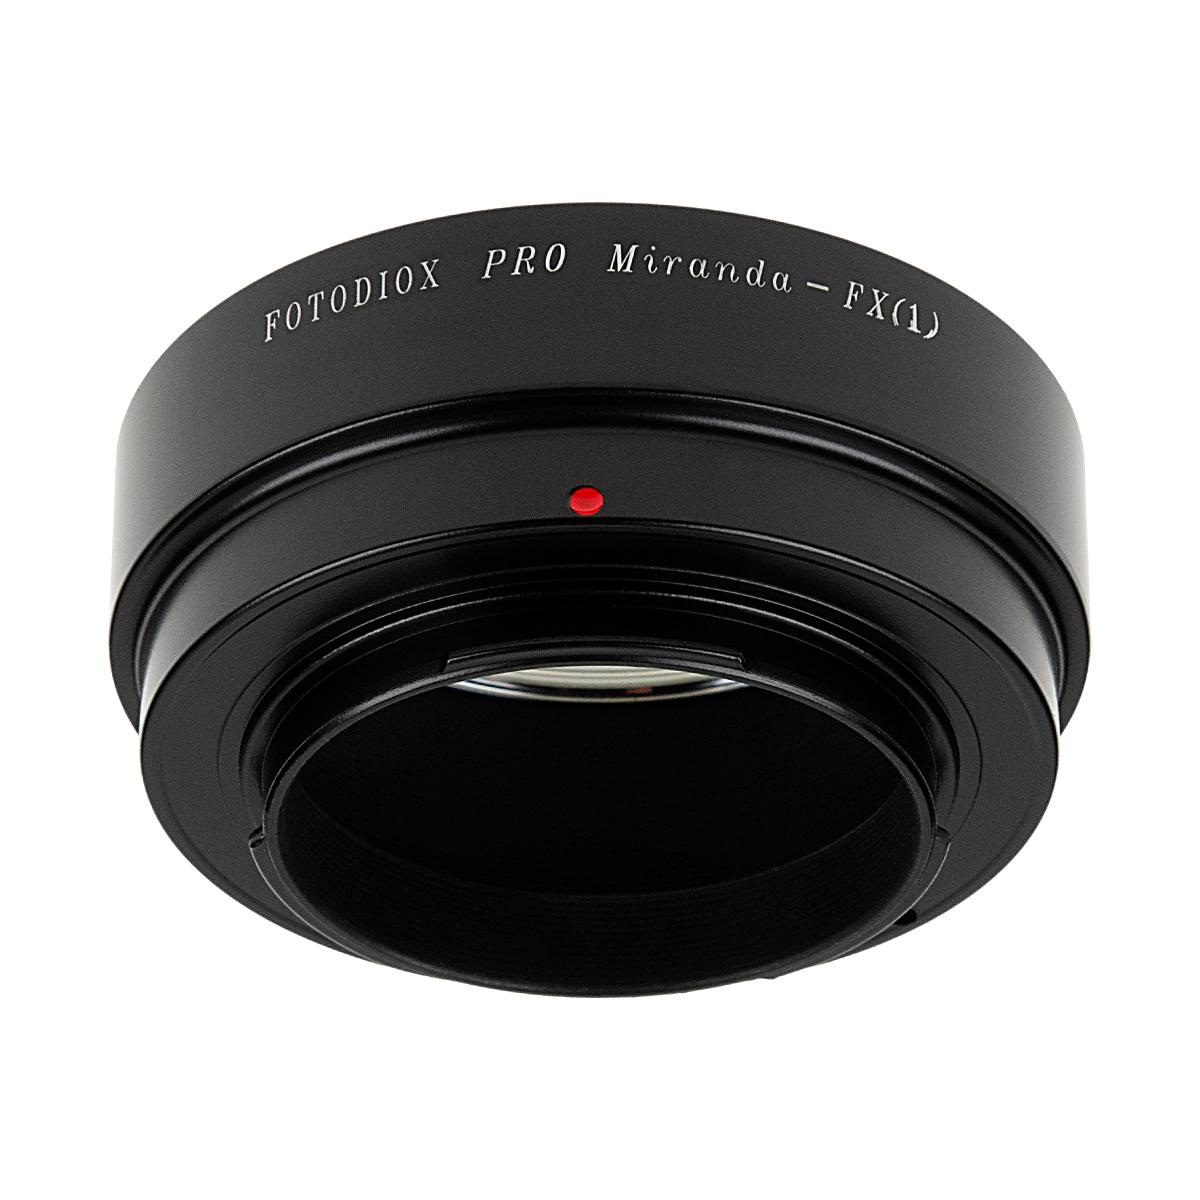 Fotodiox MIR-FXRF(ミランダマウントレンズ → 富士フイルムXマウント変換)マウントアダプター